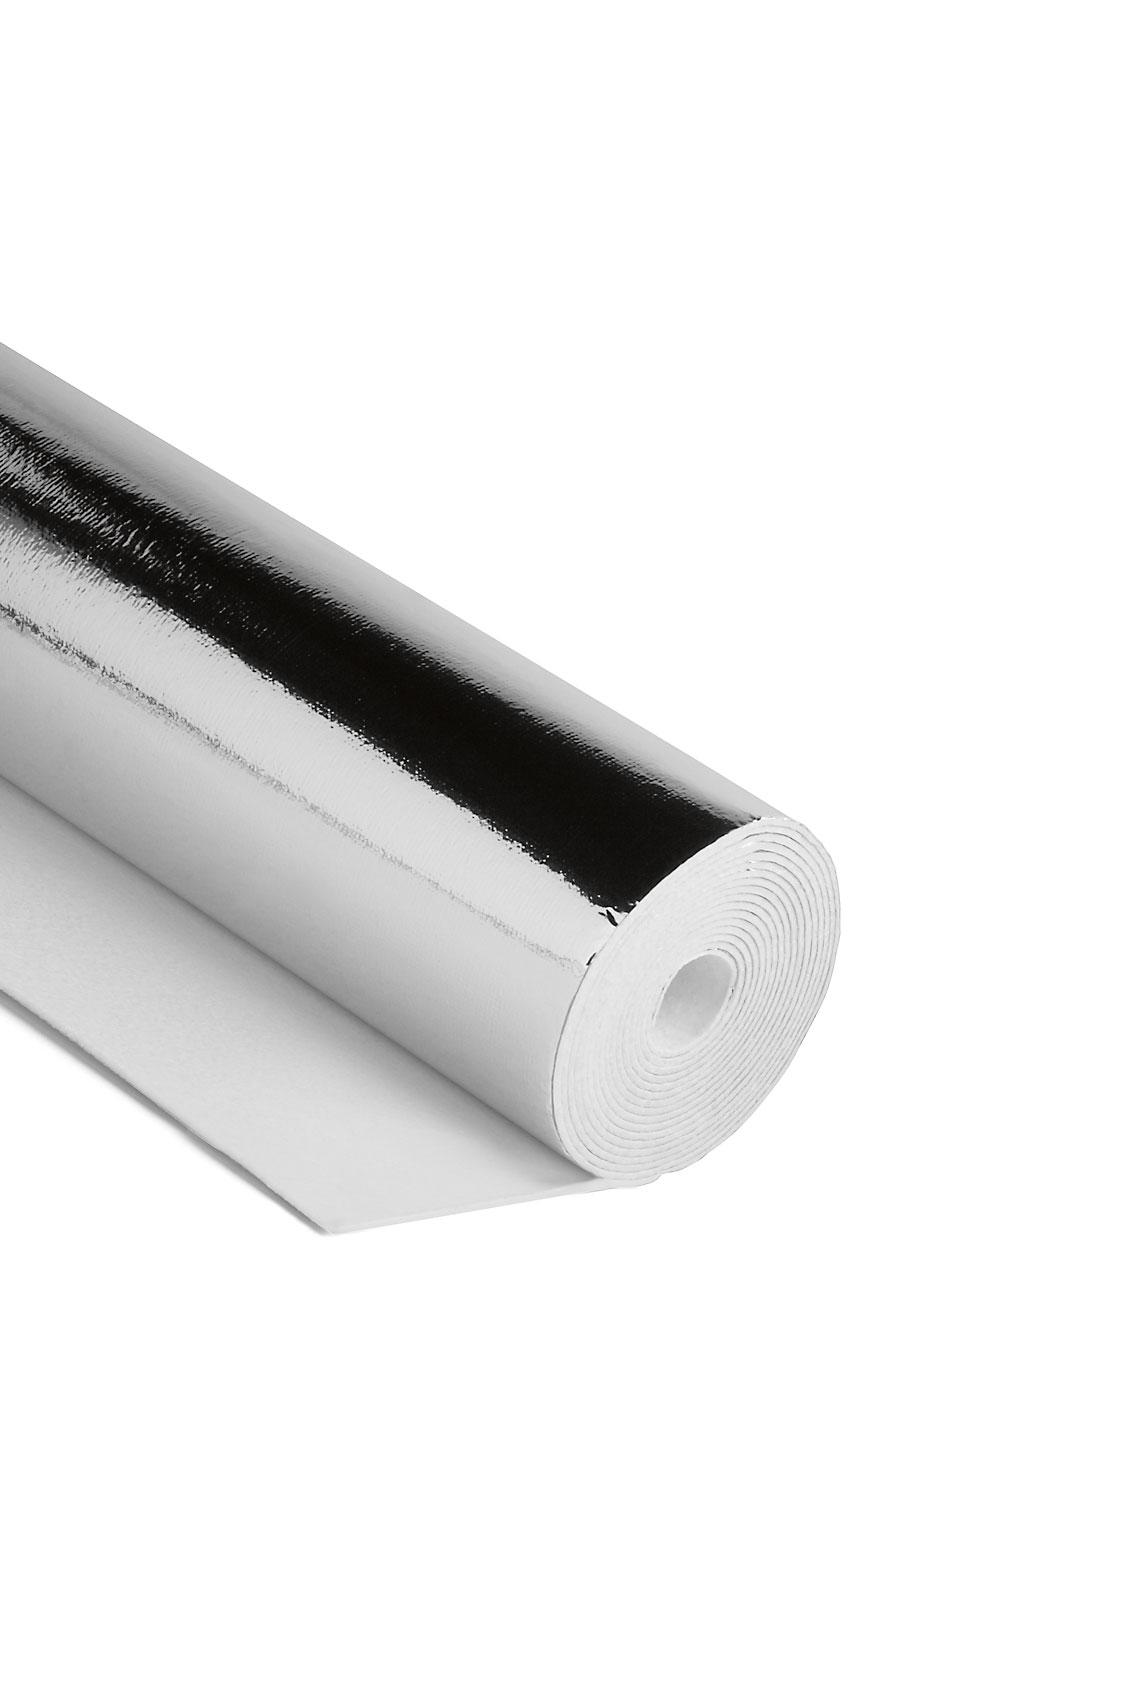 Heizkörper Polystyrol Dämmung Noma Reflex 3mm Rolle 0,5x5m Bild 1